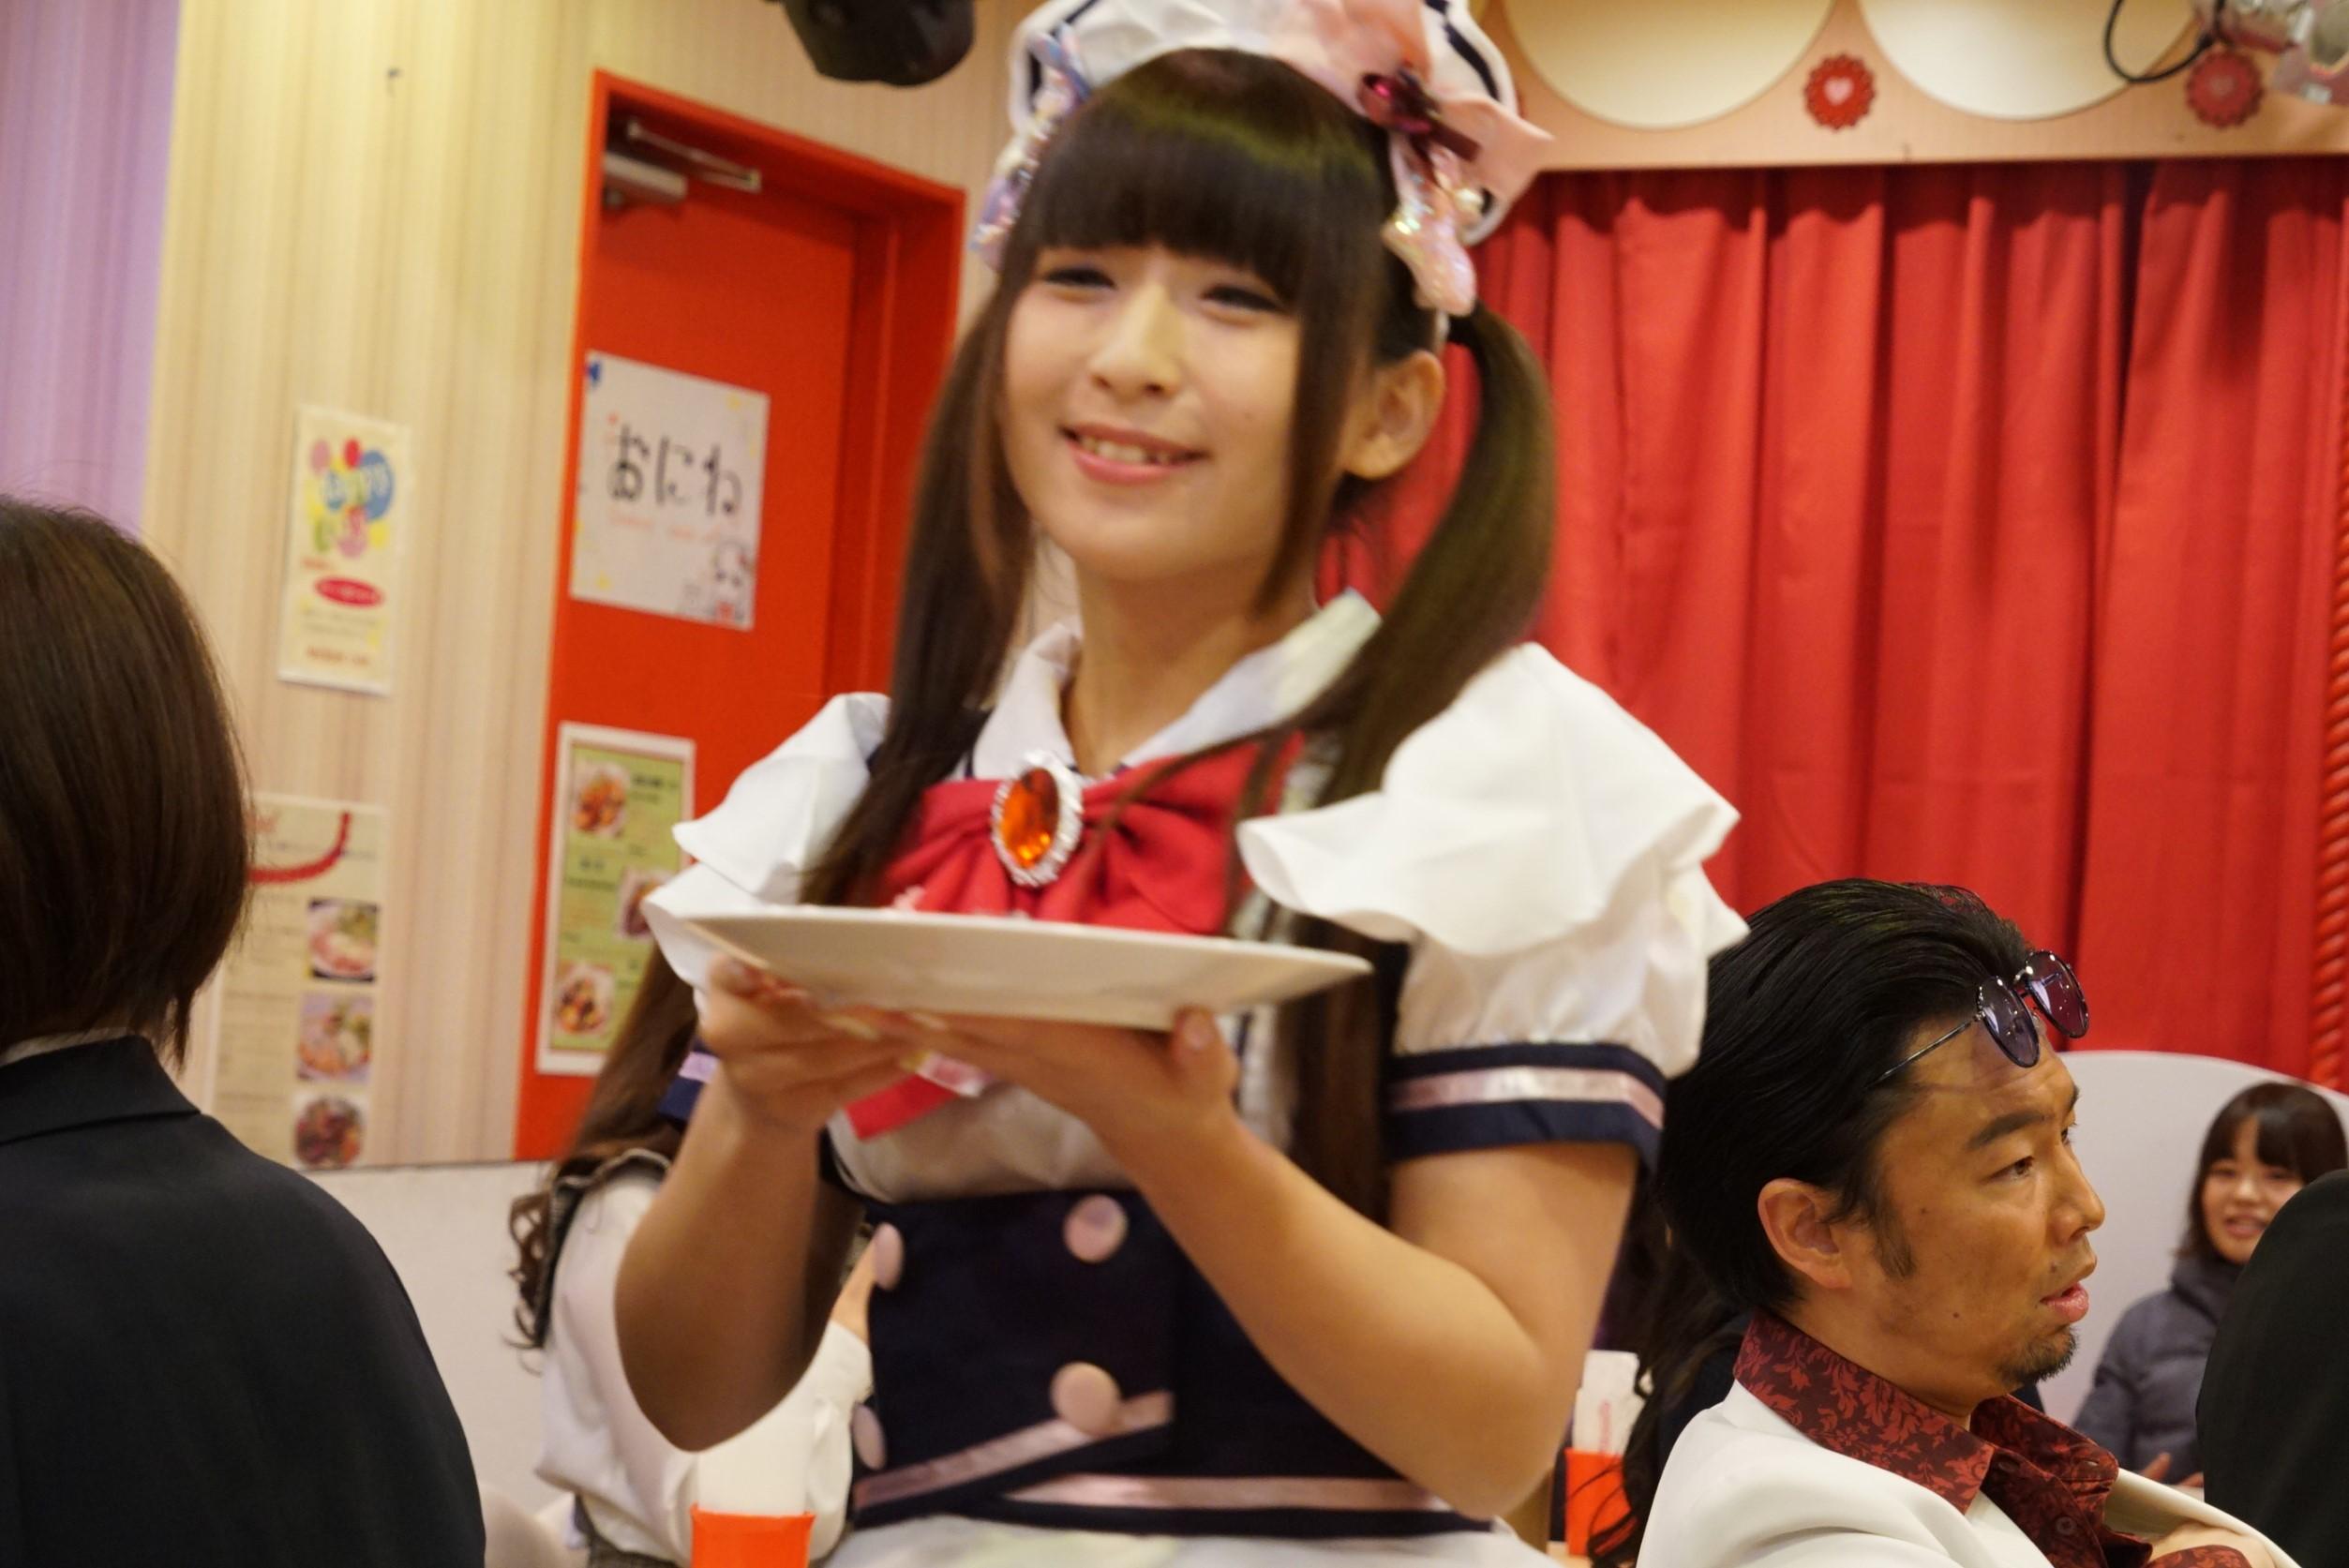 NekoPOP-maidreamin-Kuragehime-Princess-Jellyfish-Fuji-Tv-ep3-1